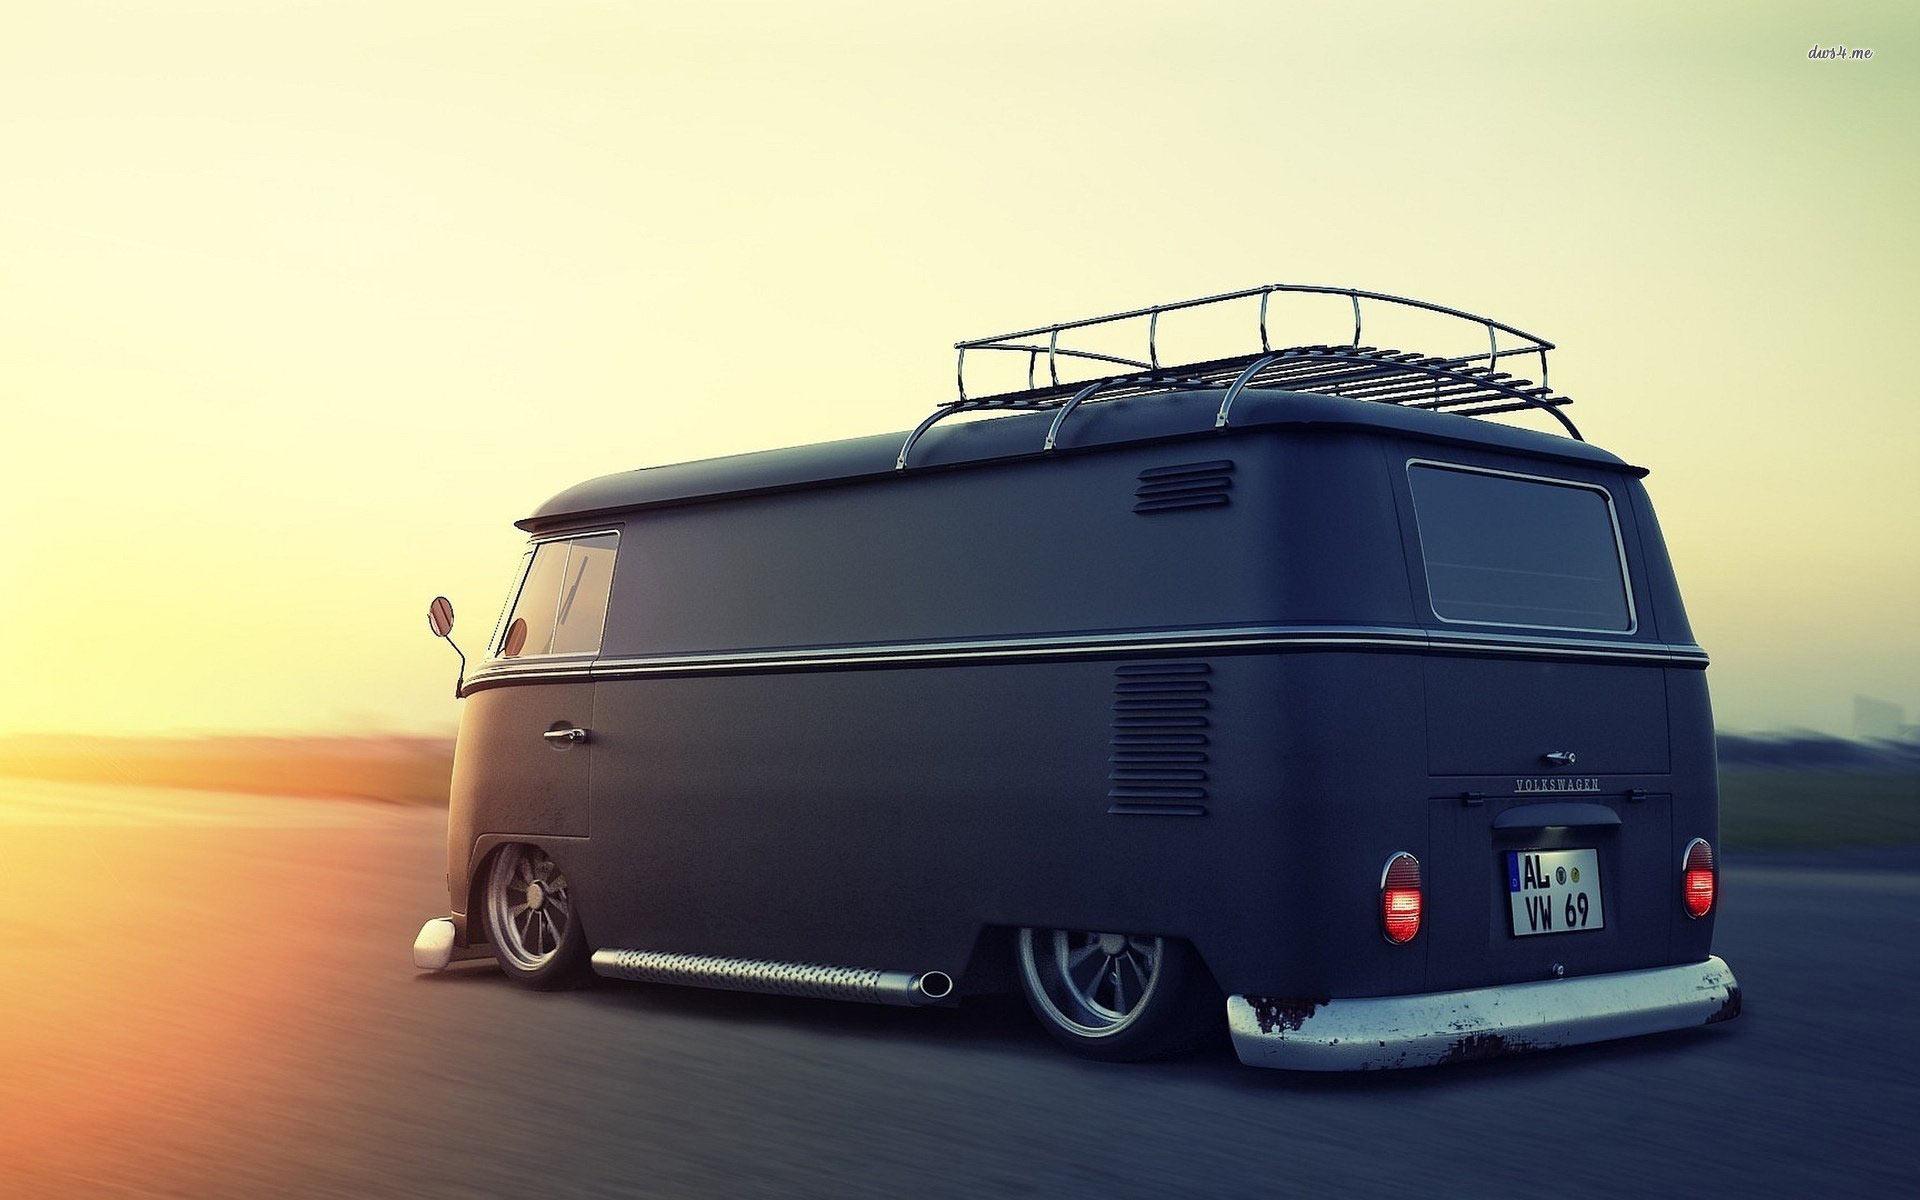 carro tunado kombi volkswagen papel de parede gr tis para pc hd. Black Bedroom Furniture Sets. Home Design Ideas